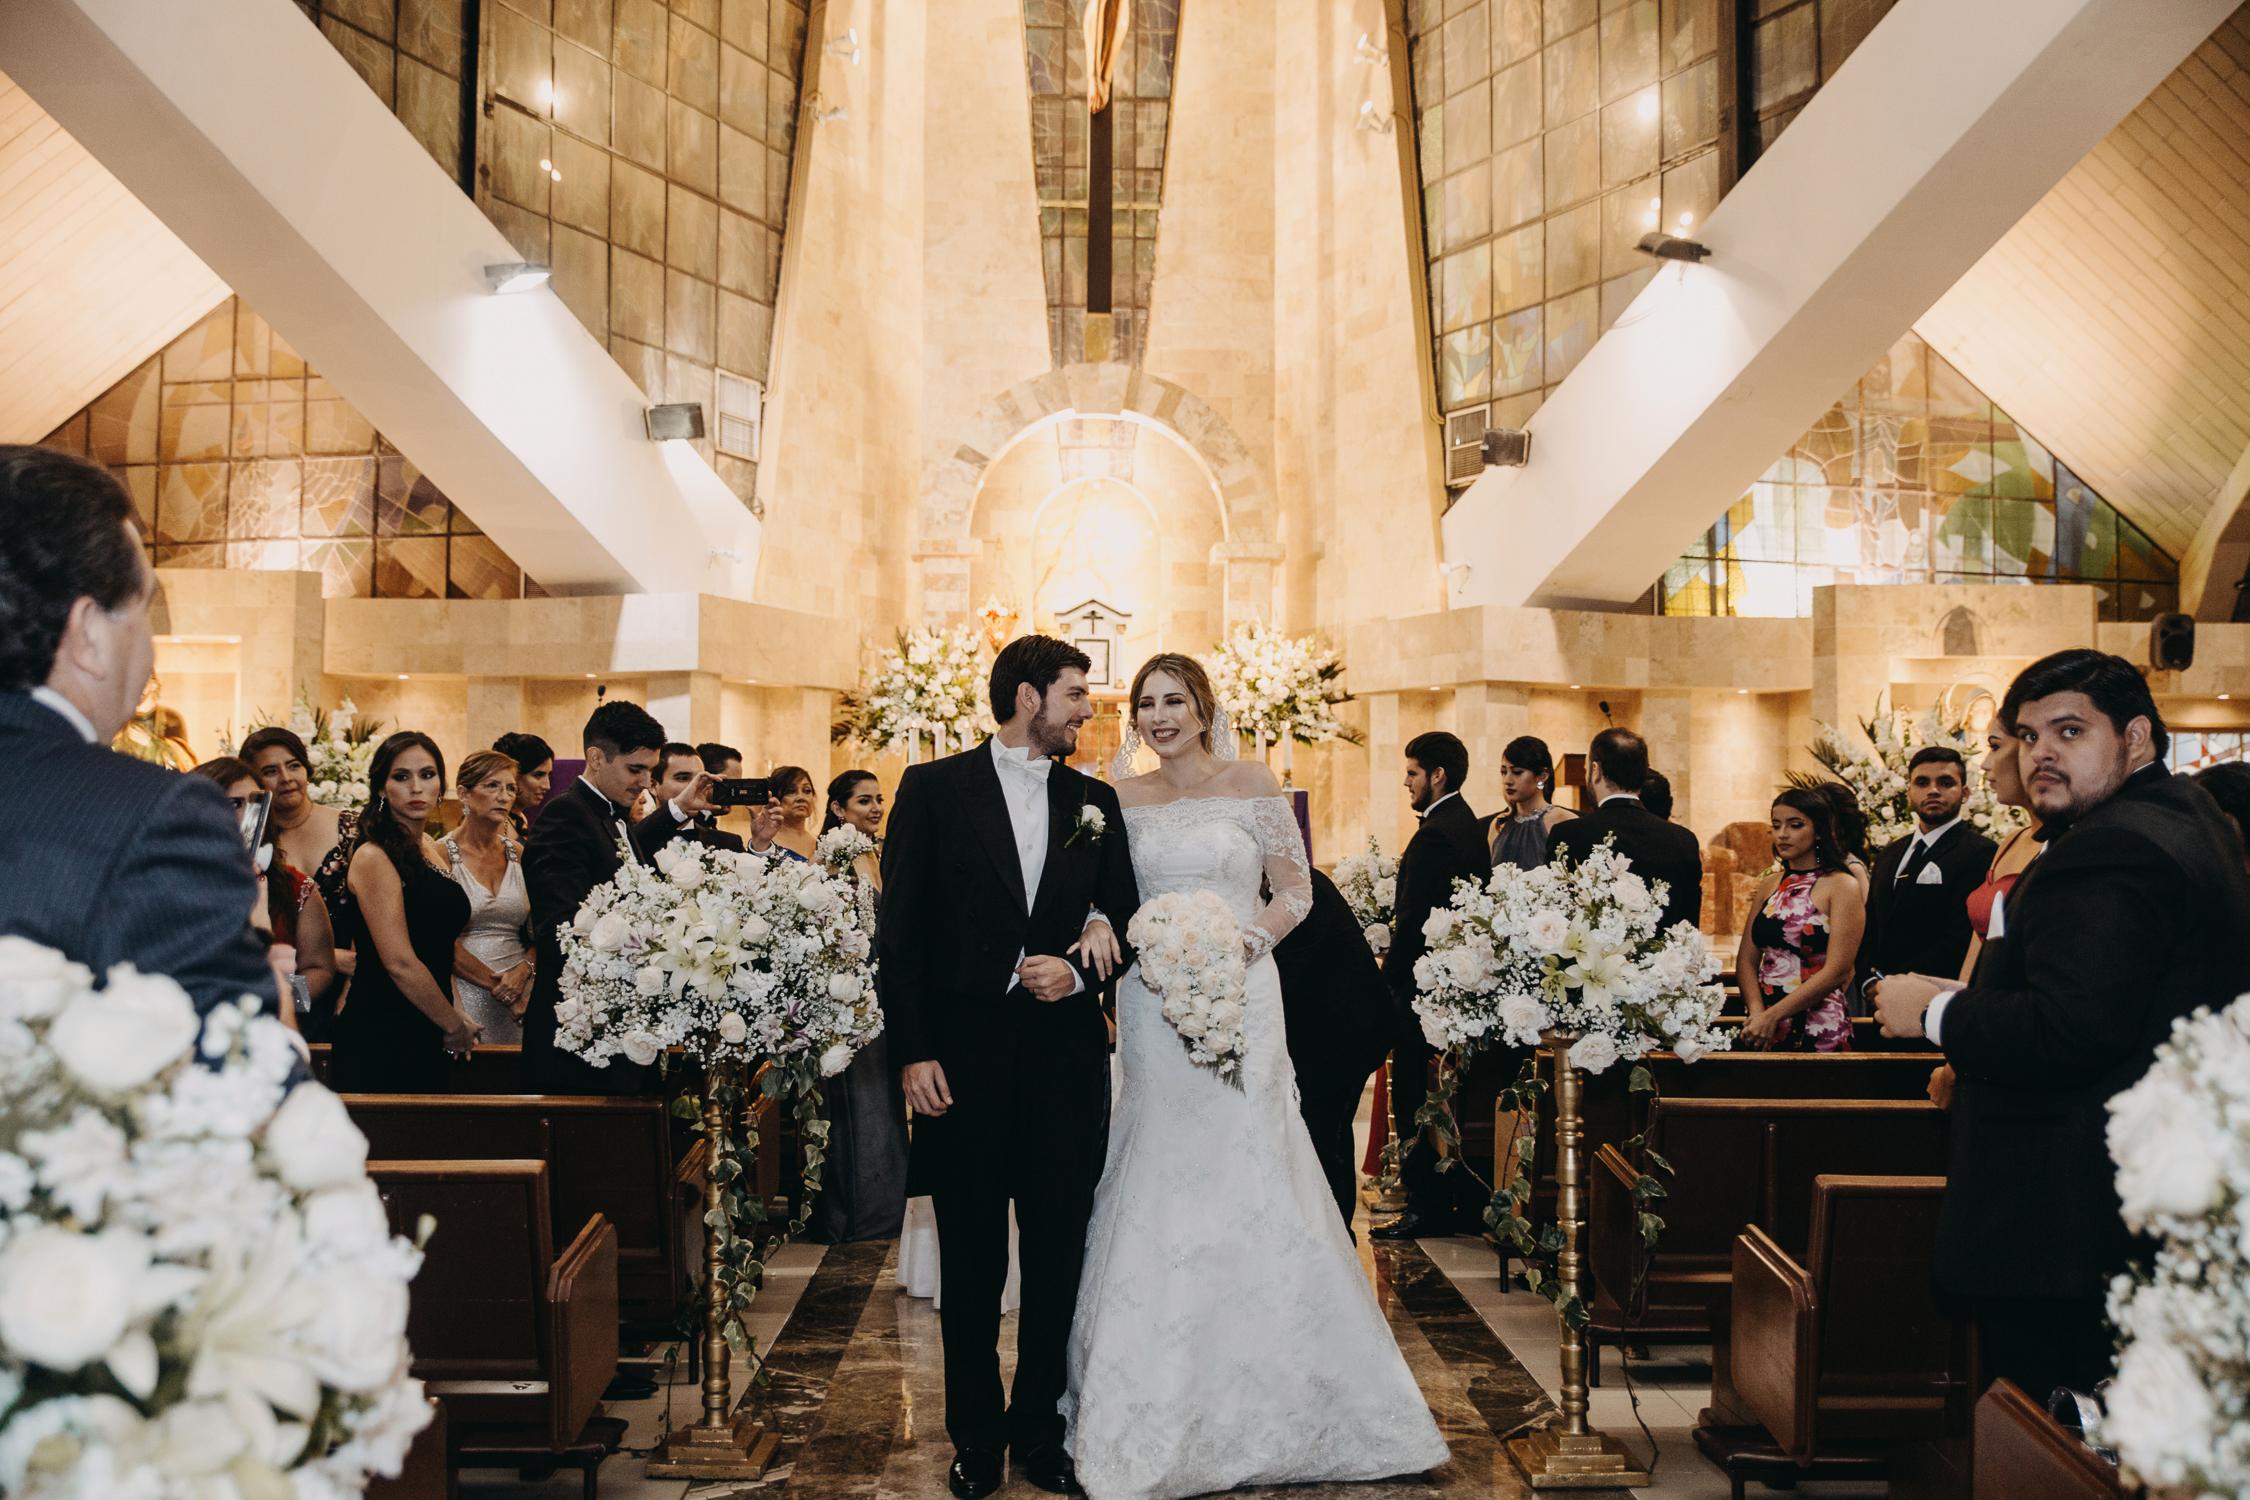 Michelle-Agurto-Fotografia-Bodas-Ecuador-Destination-Wedding-Photographer-Vicky-Javier-108.JPG